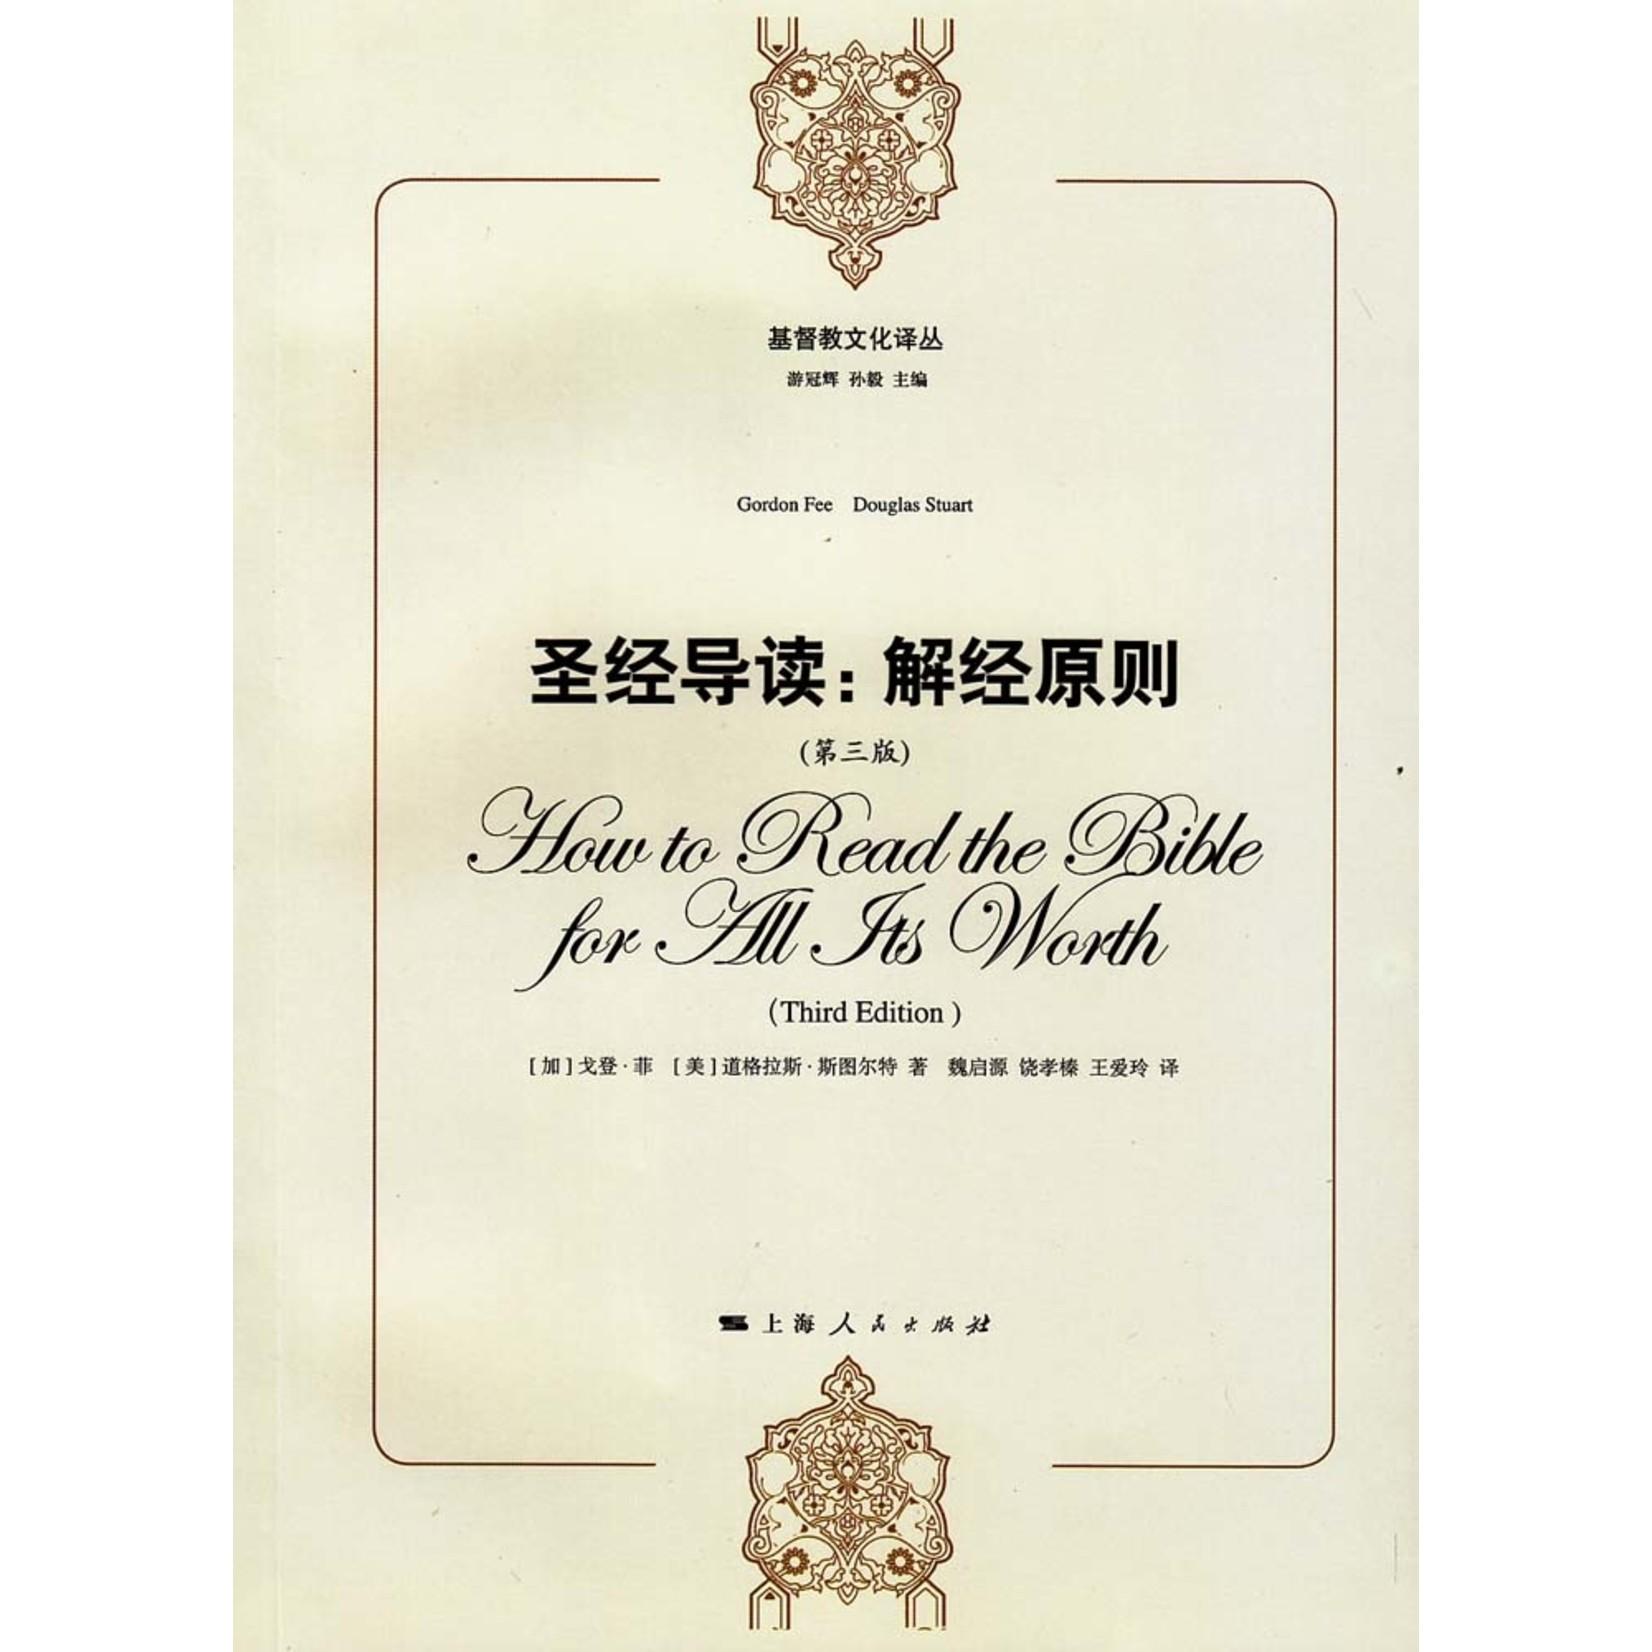 上海人民出版社 Shanghai People's Press 聖經導讀:解經原則(第三版)(簡體) How to Read the Bible for All Its Worth